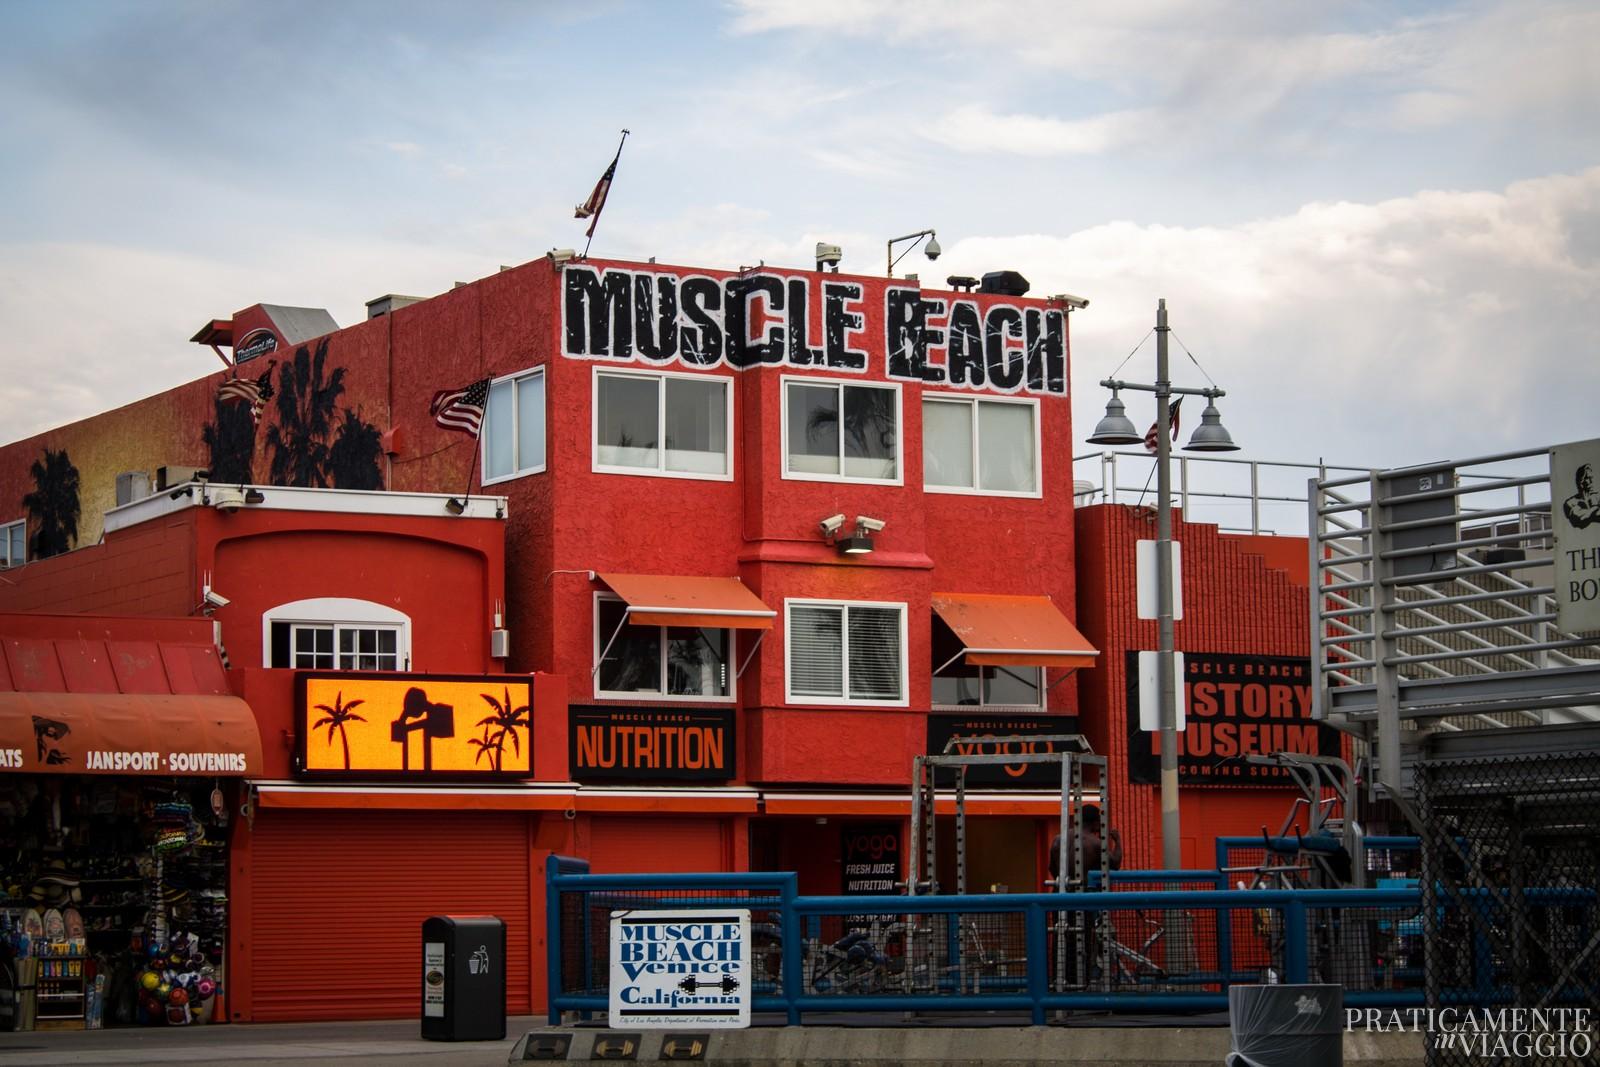 Muscle beach a Venice beach